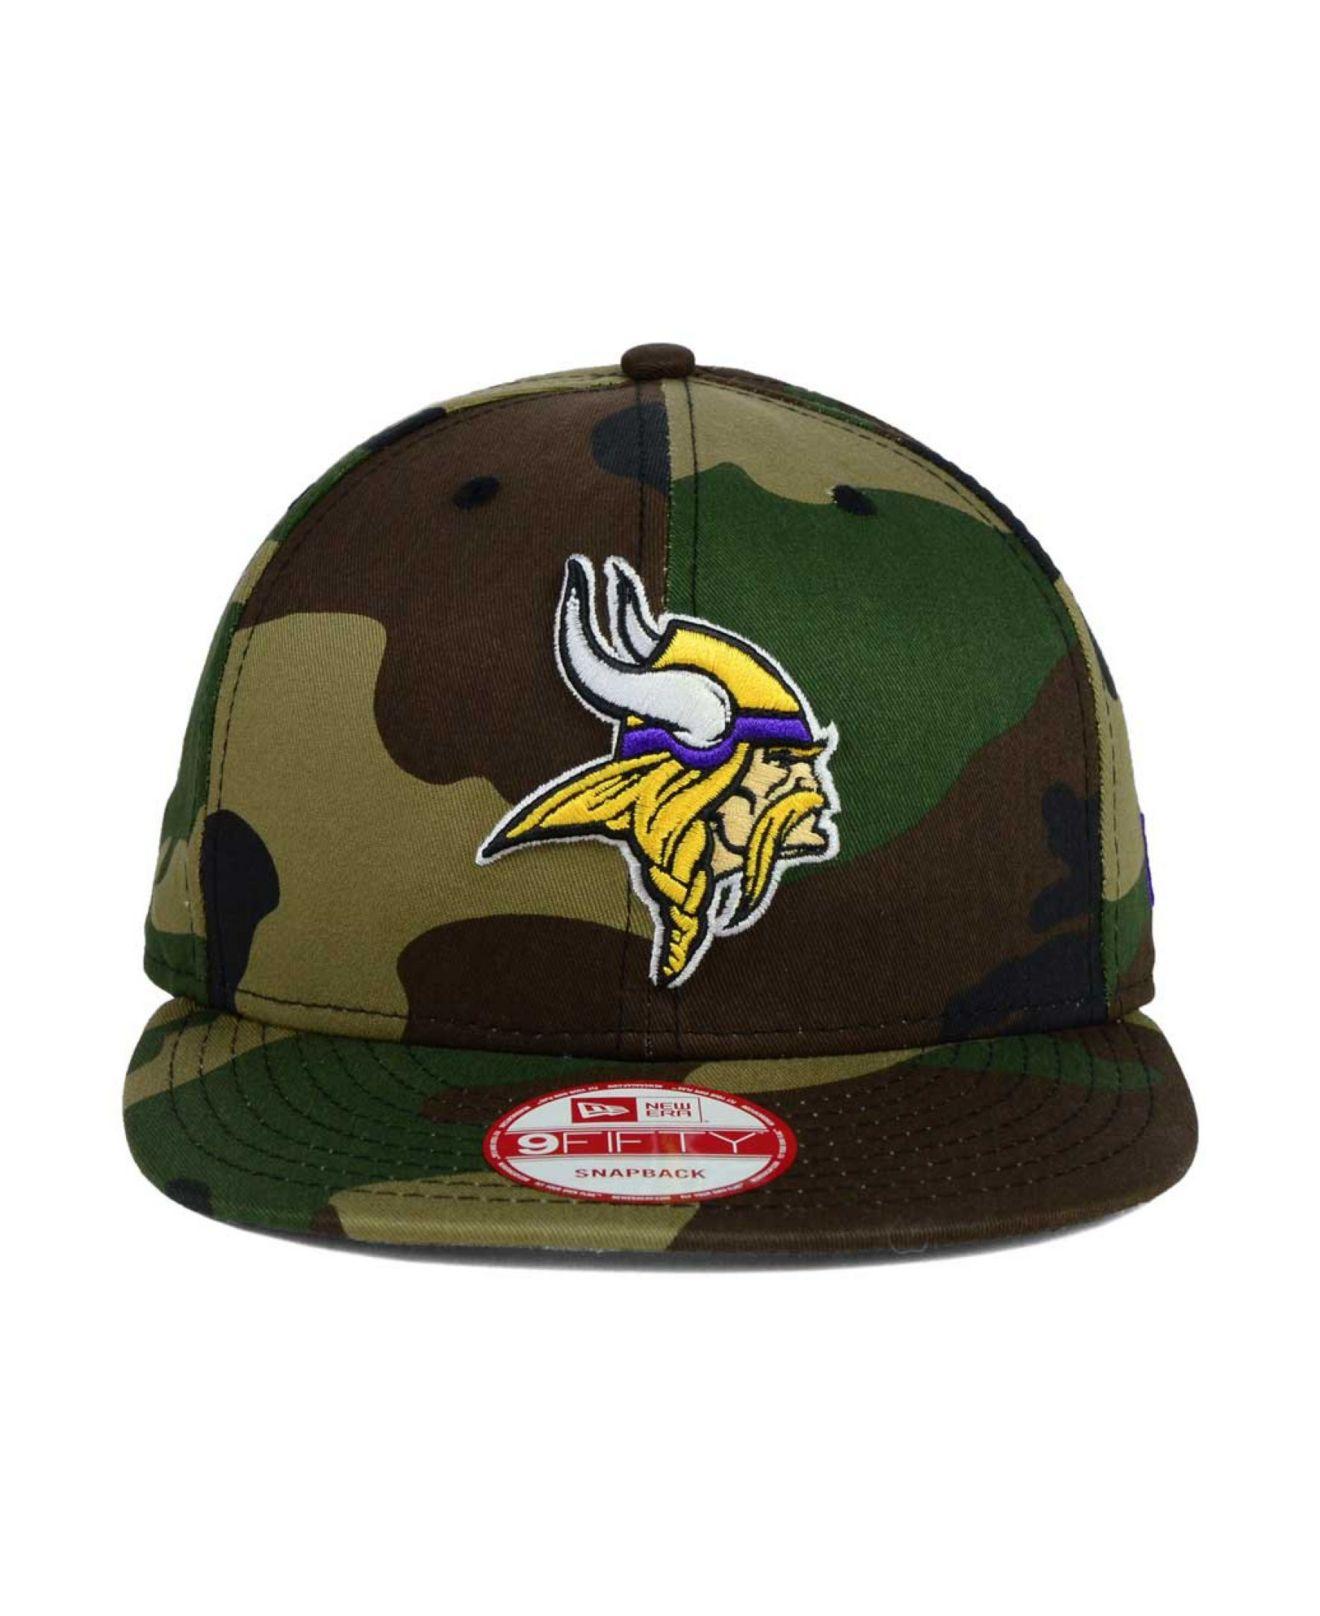 bfc4869e8 KTZ Minnesota Vikings Woodland Camo Team Color 9Fifty Snapback Cap ...